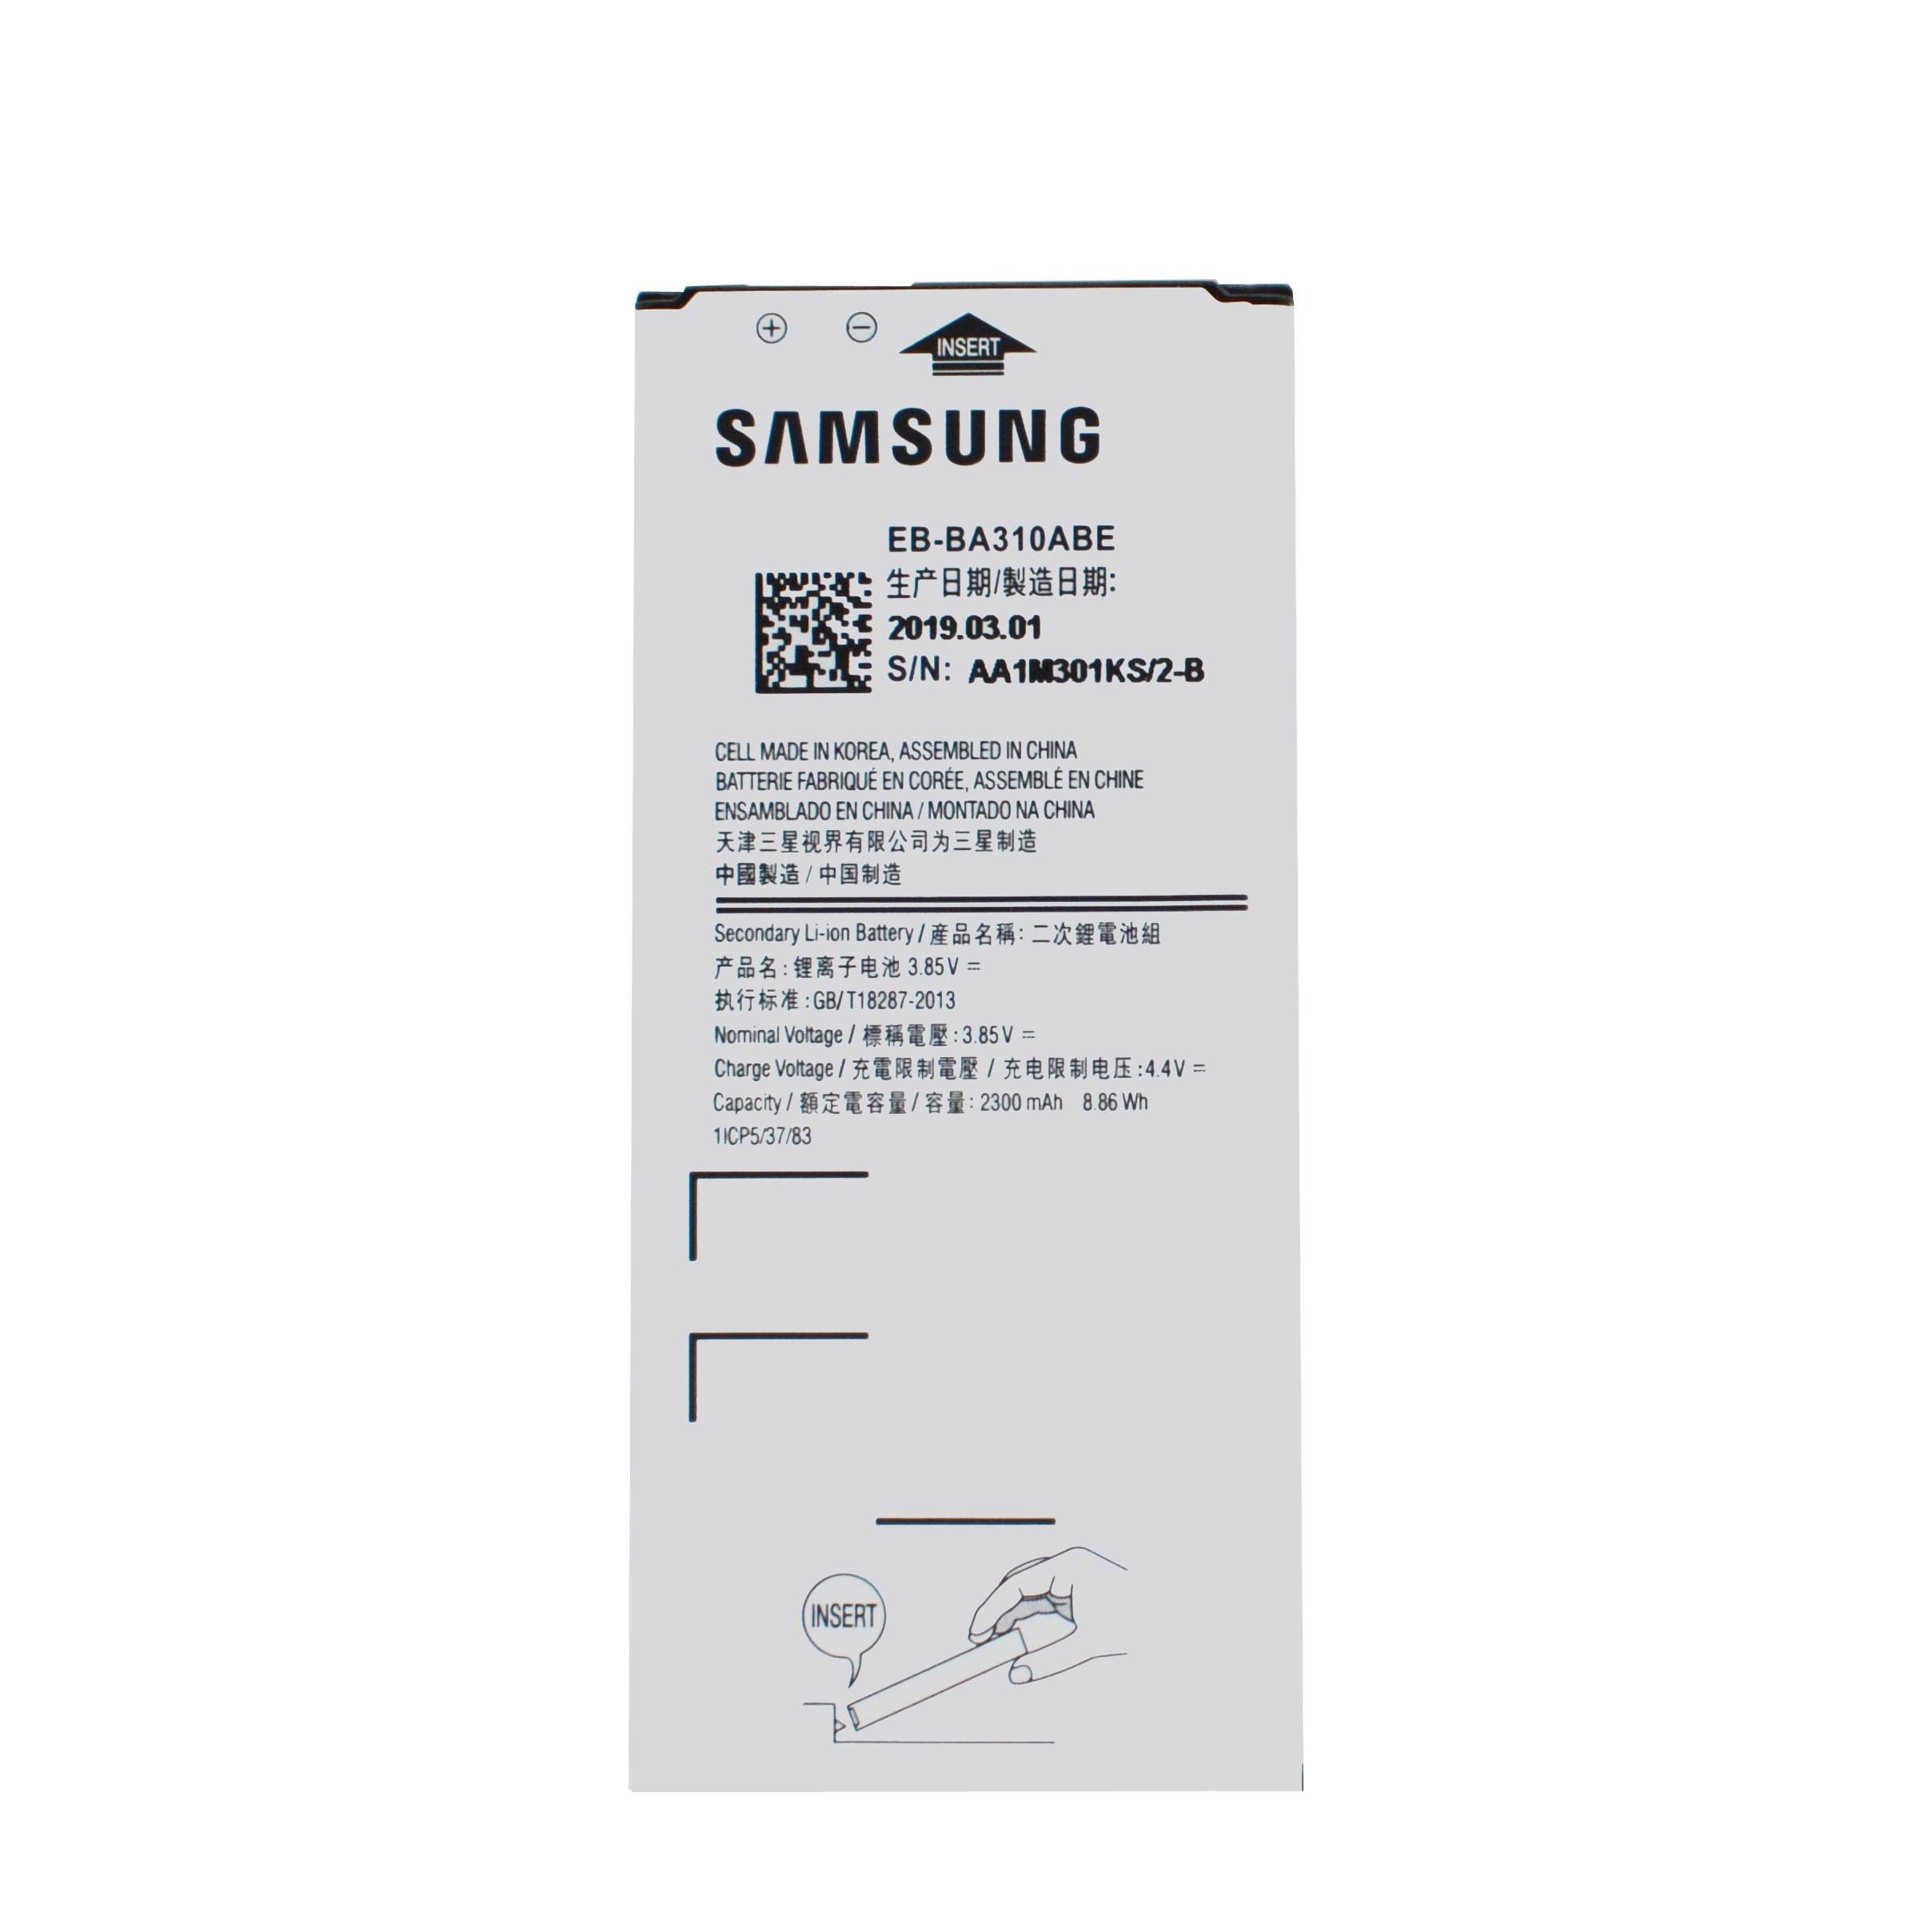 20pcs/lot High Quality Battery EB-BA310ABE For Samsung Galaxy A3 2016 Edition A310F A310 Bateria 2300mAh AKKU In Stock enlarge